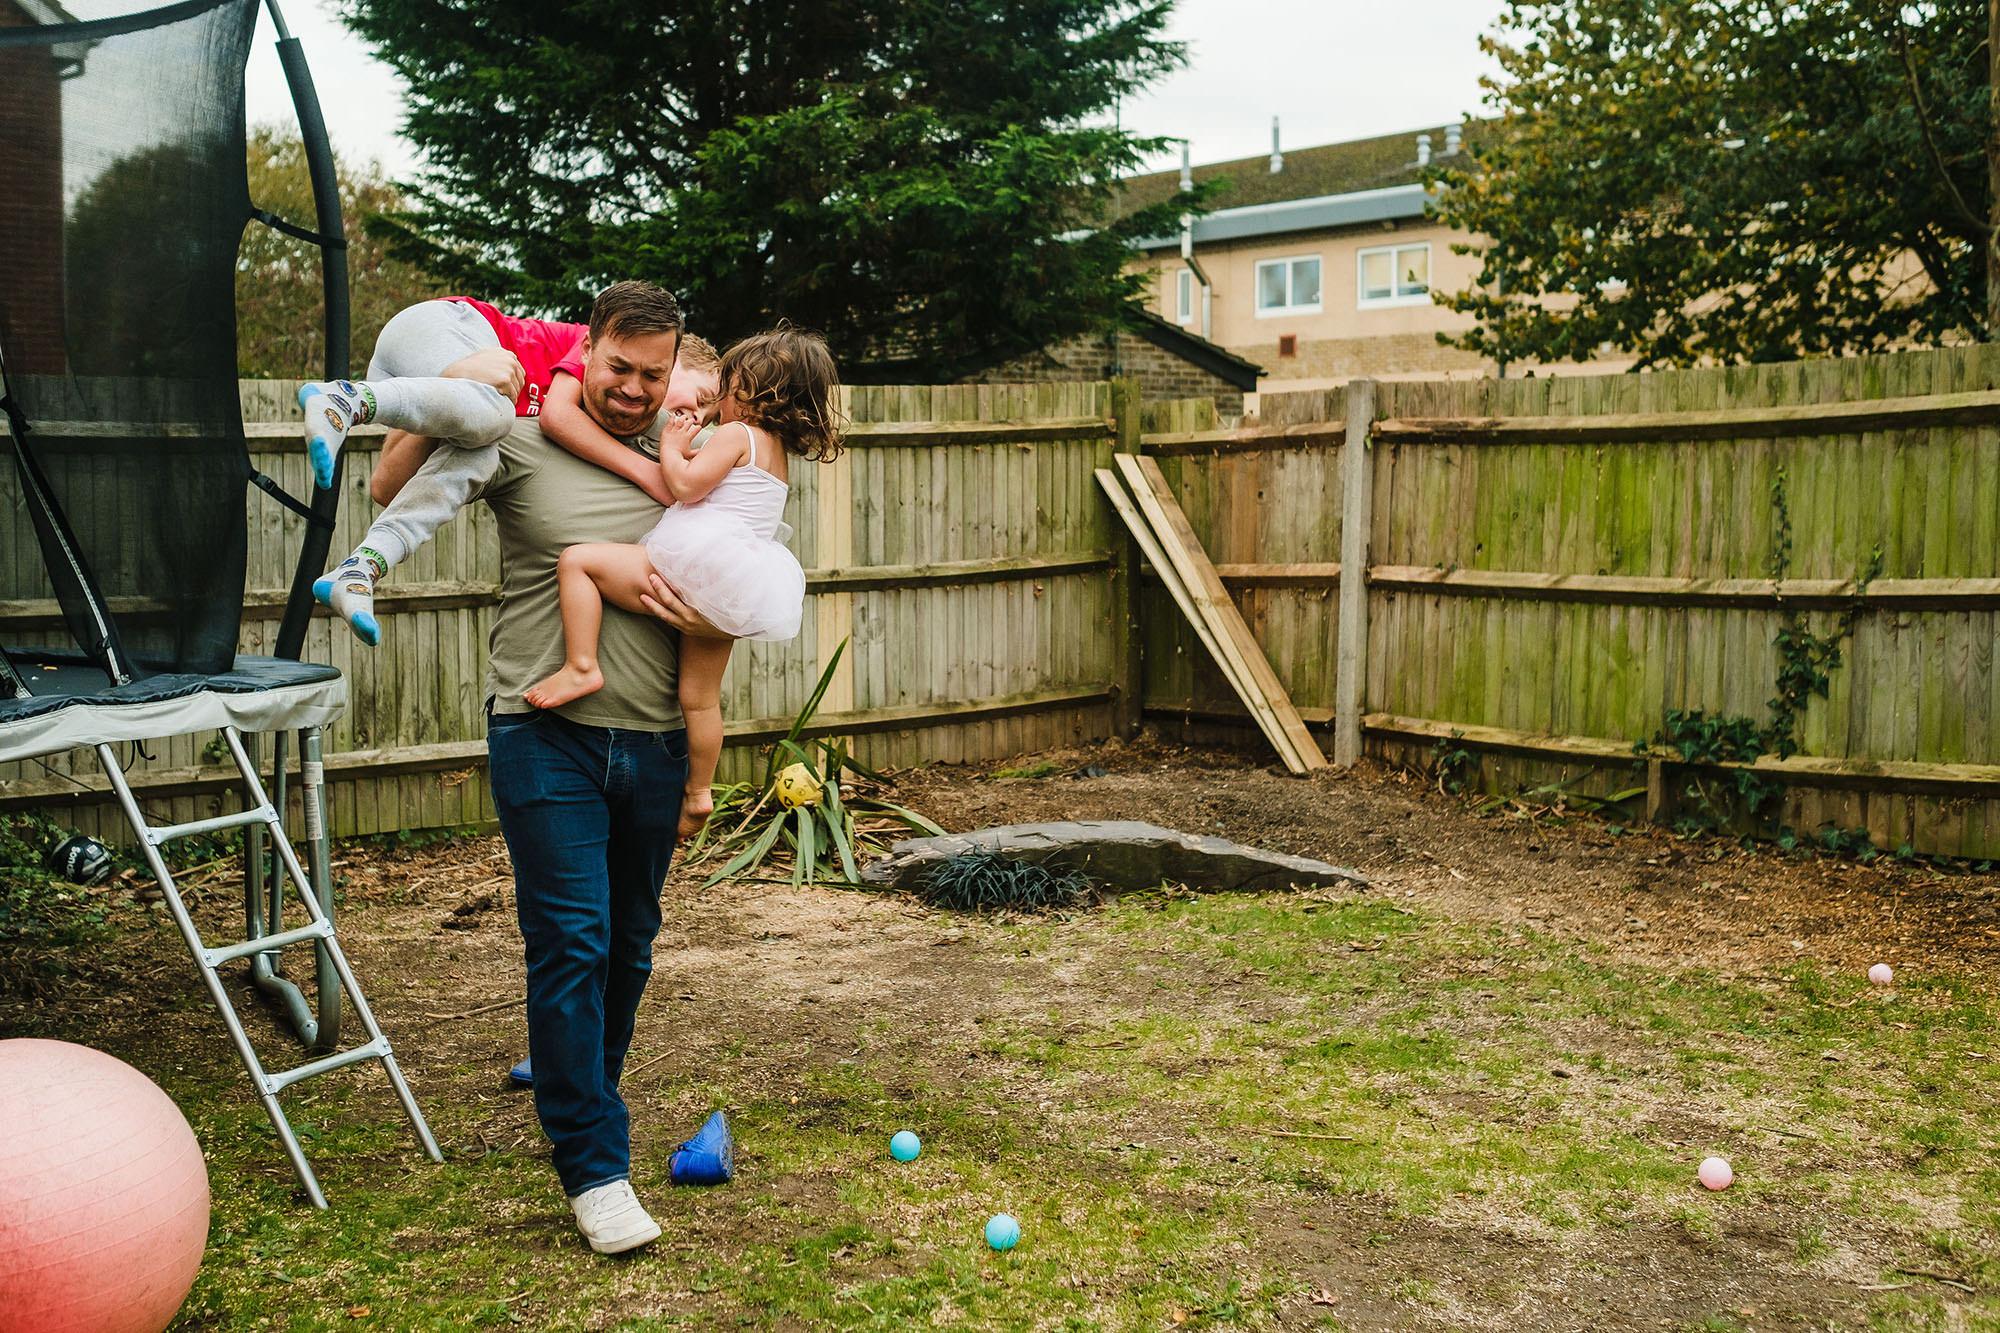 dad with kids in garden